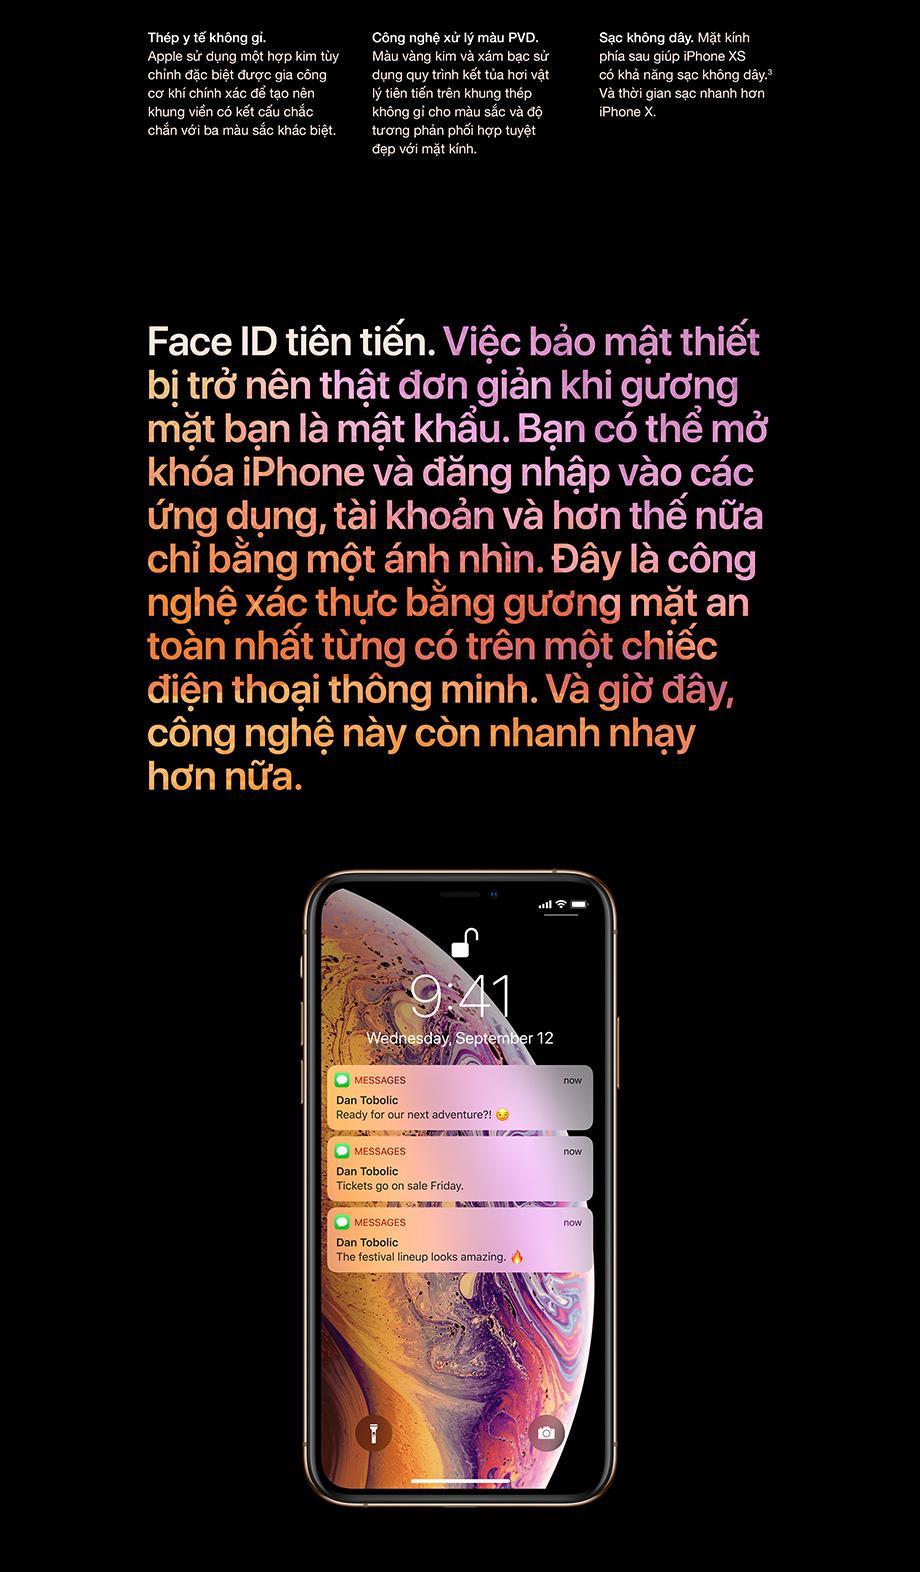 iPhone-XS-&-XS-Max_03.jpg